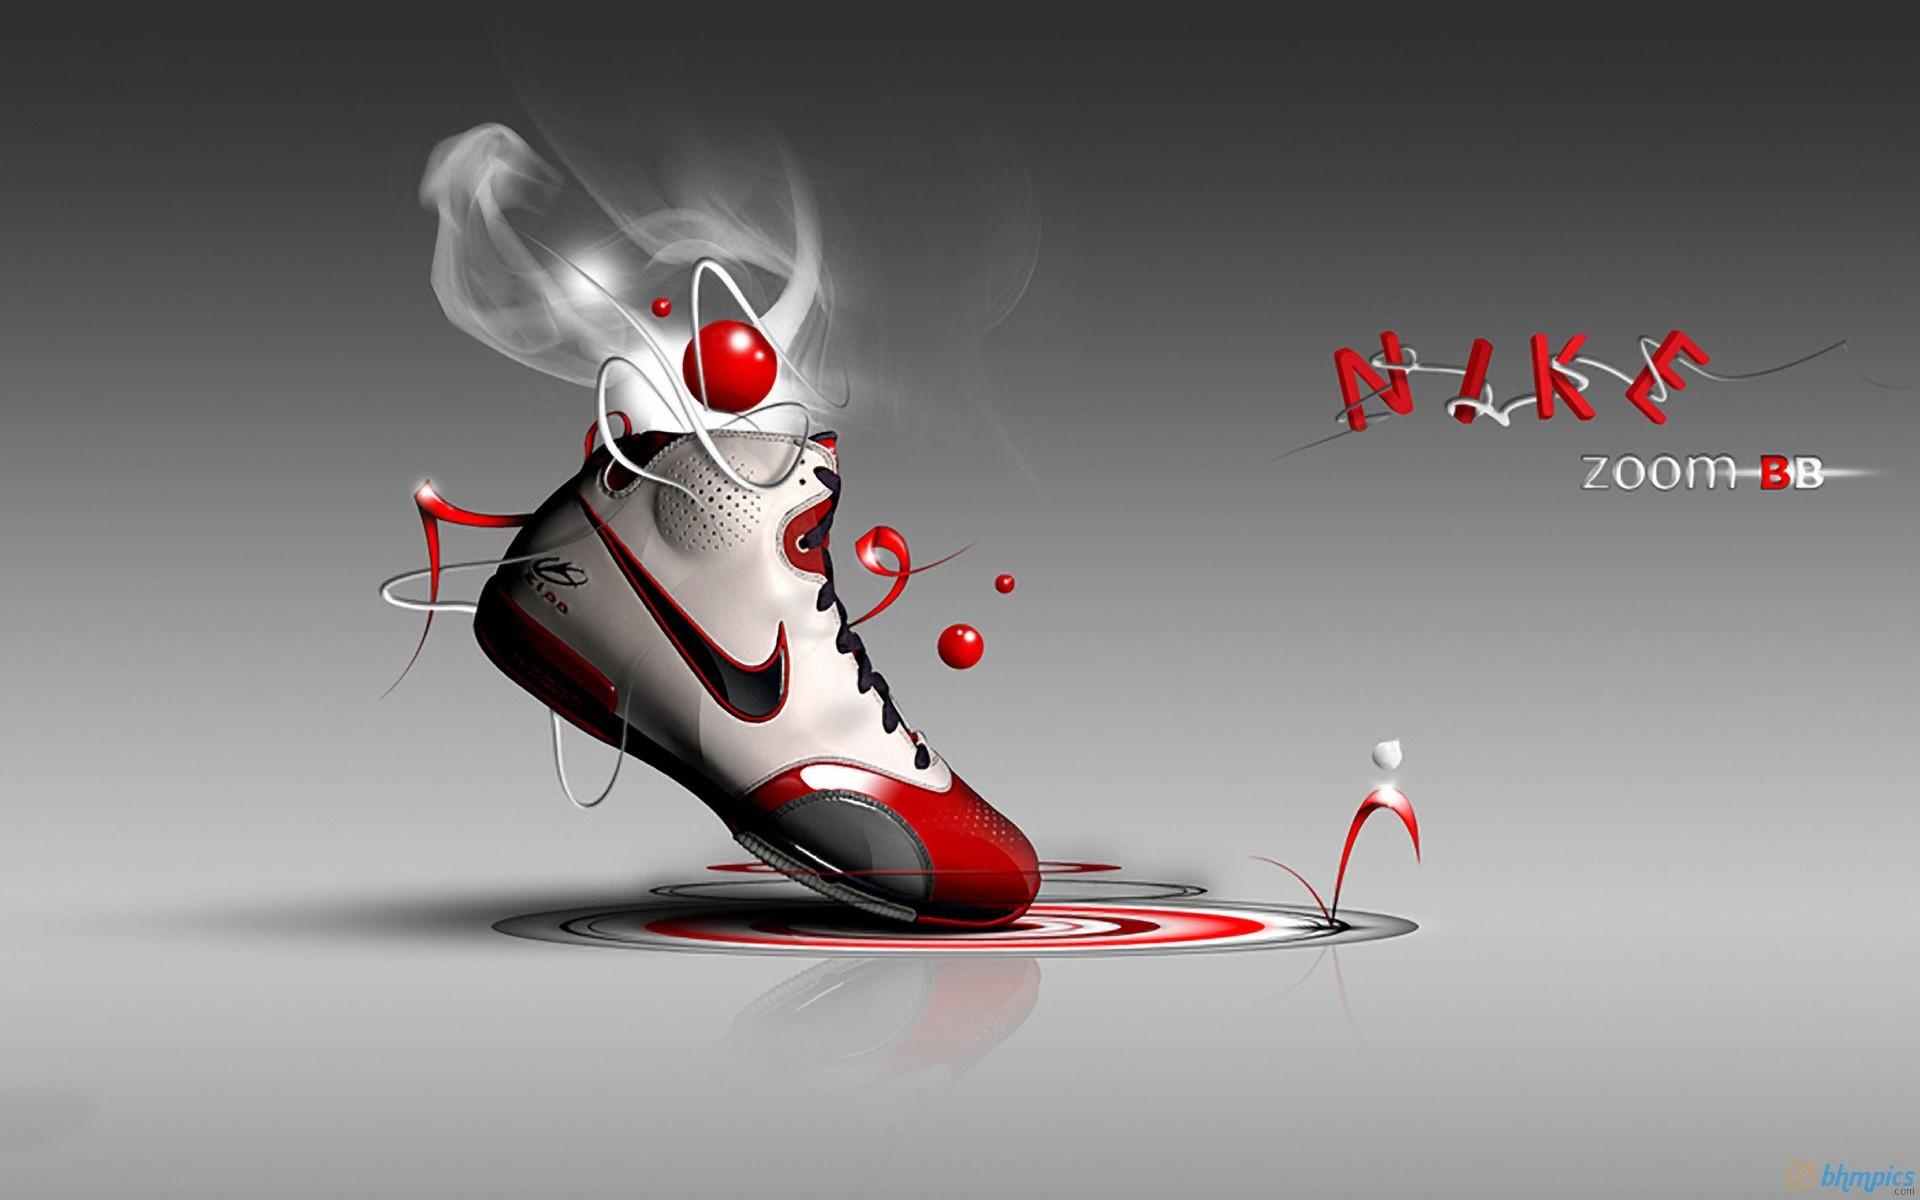 NIKE Sneaker Zoom BB